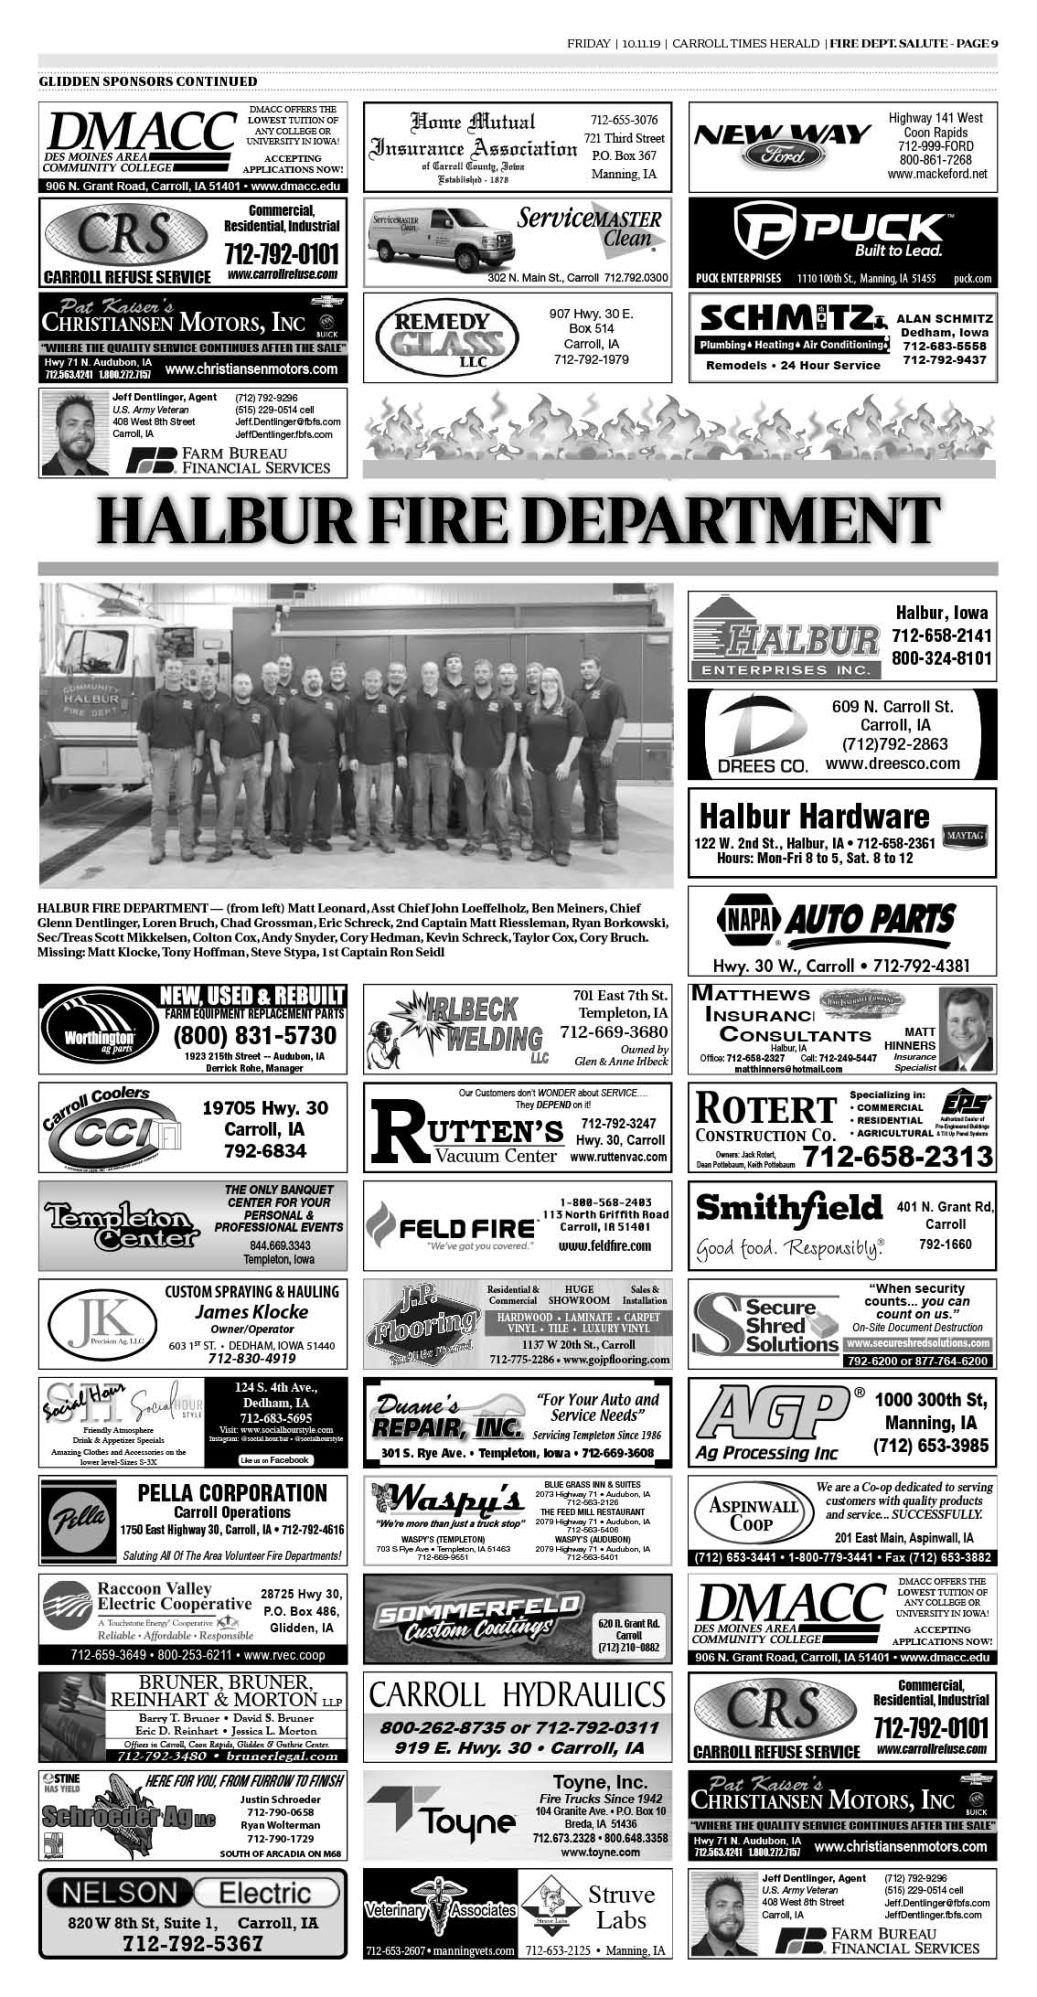 10-11 FIRE-Page 09.jpg